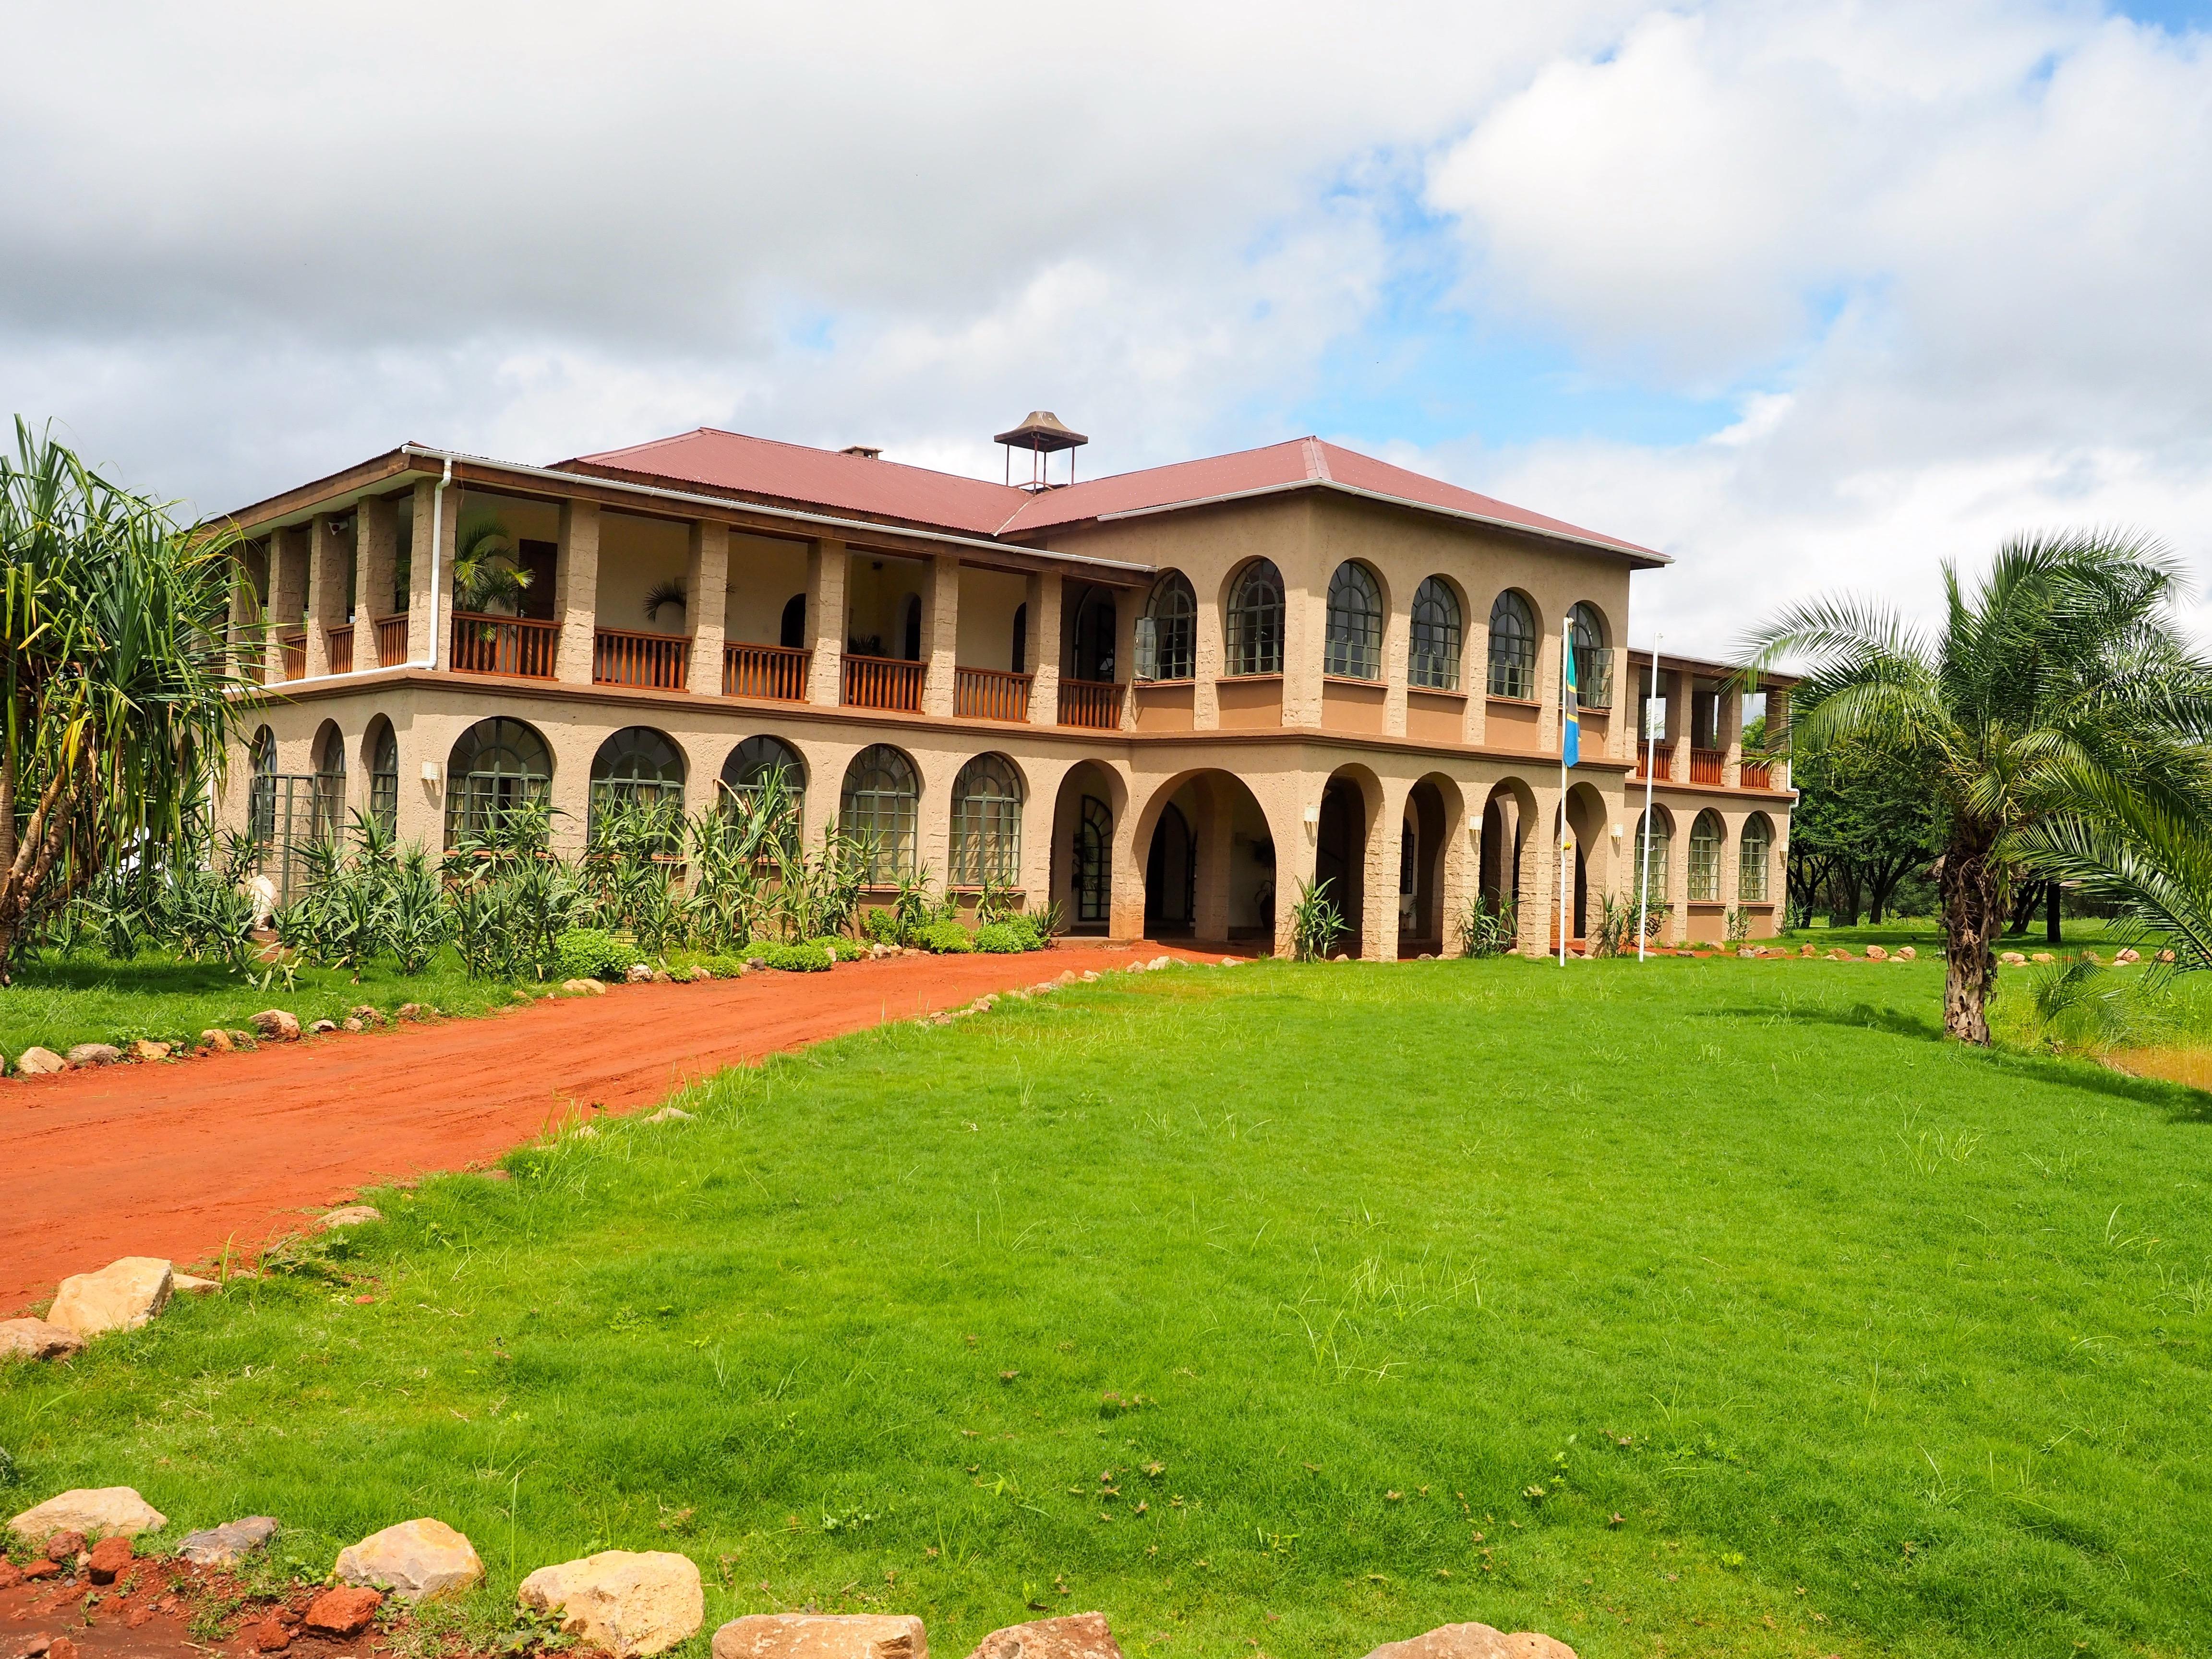 Le club-house du Kili Golf